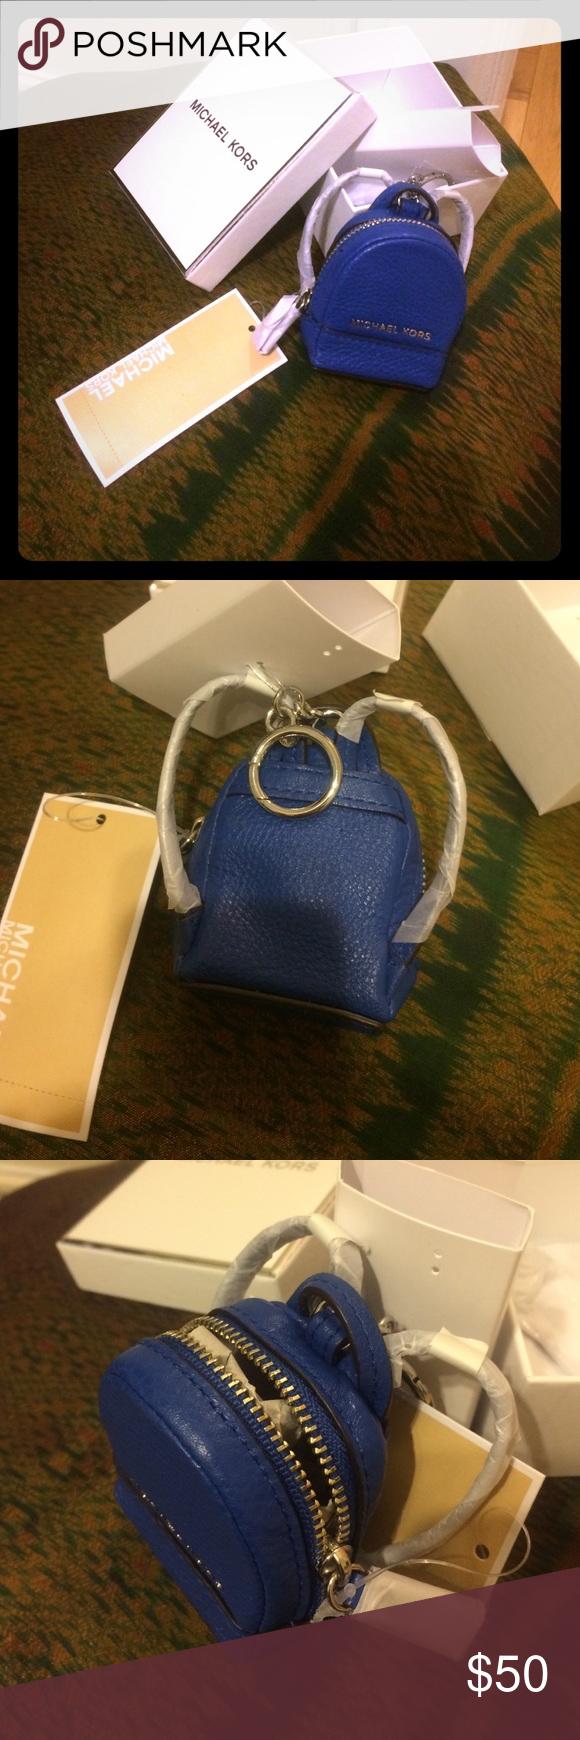 MICHAEL KORS .. keychain/coin purse BRAND NEW... blue Michael kors mini backpack keychain.. perfect for coins KORS Michael Kors Bags Mini Bags